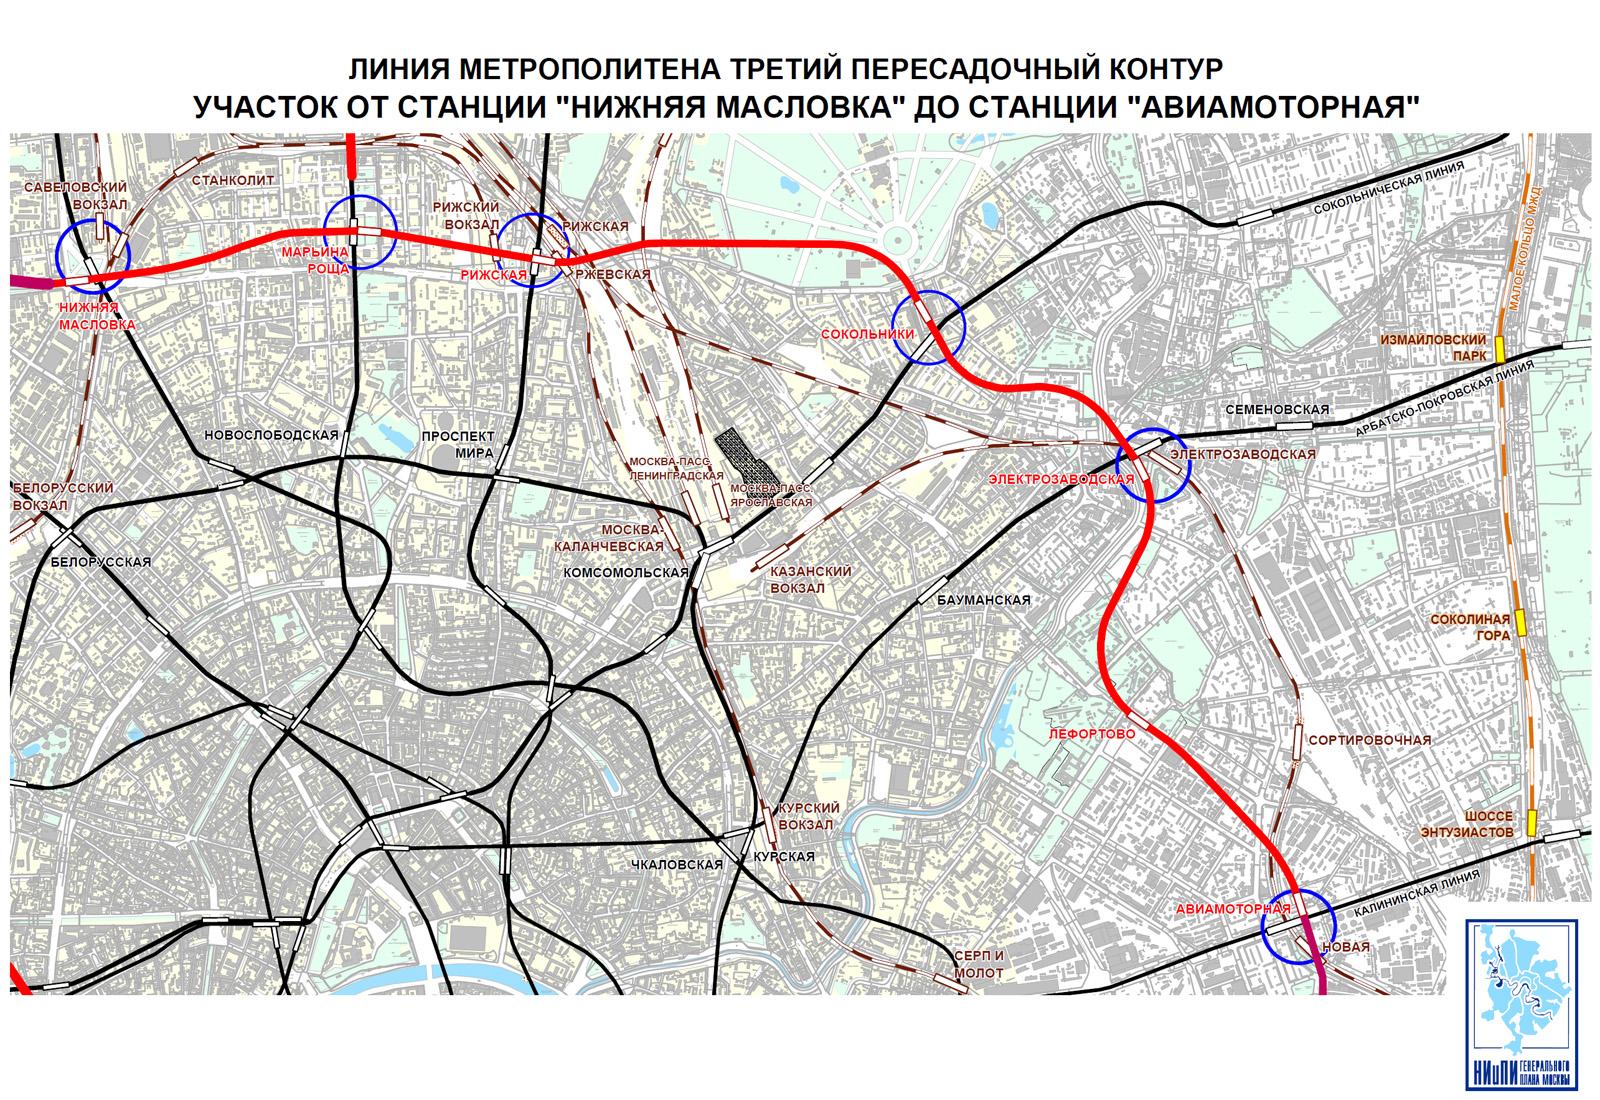 Третий пересадочный контур схема метро